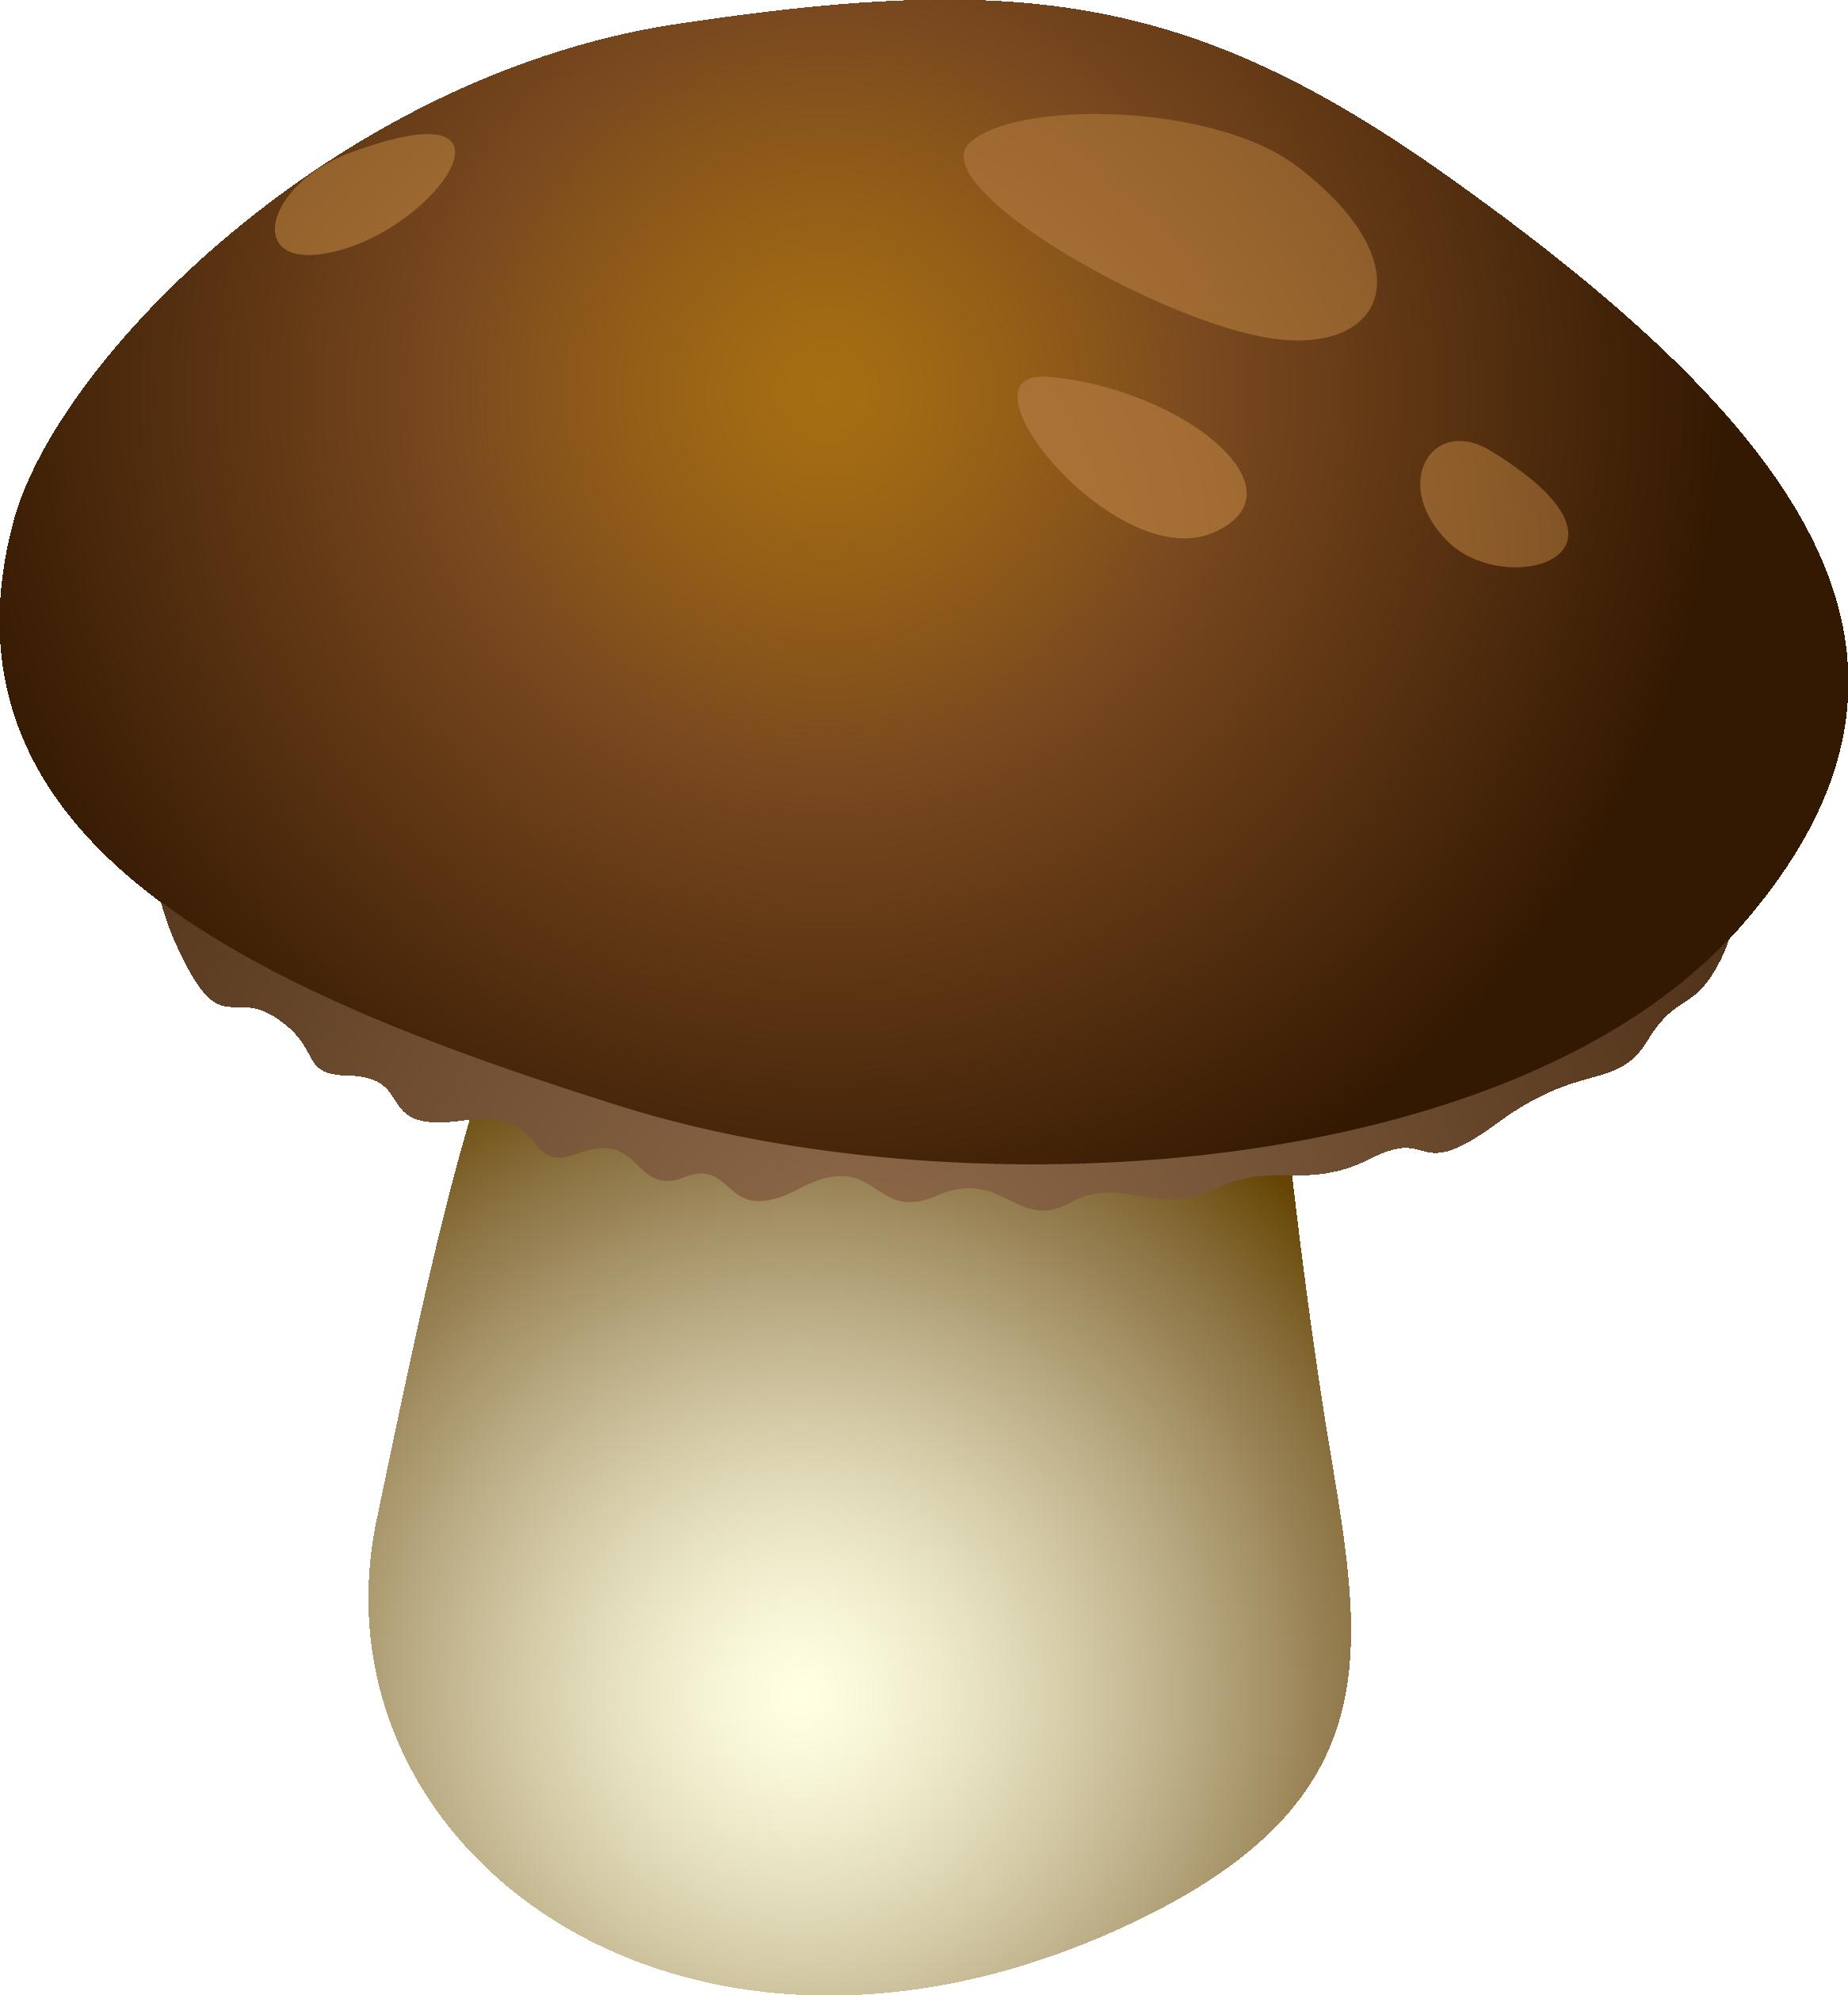 маленький грибочек картинка бройлеры